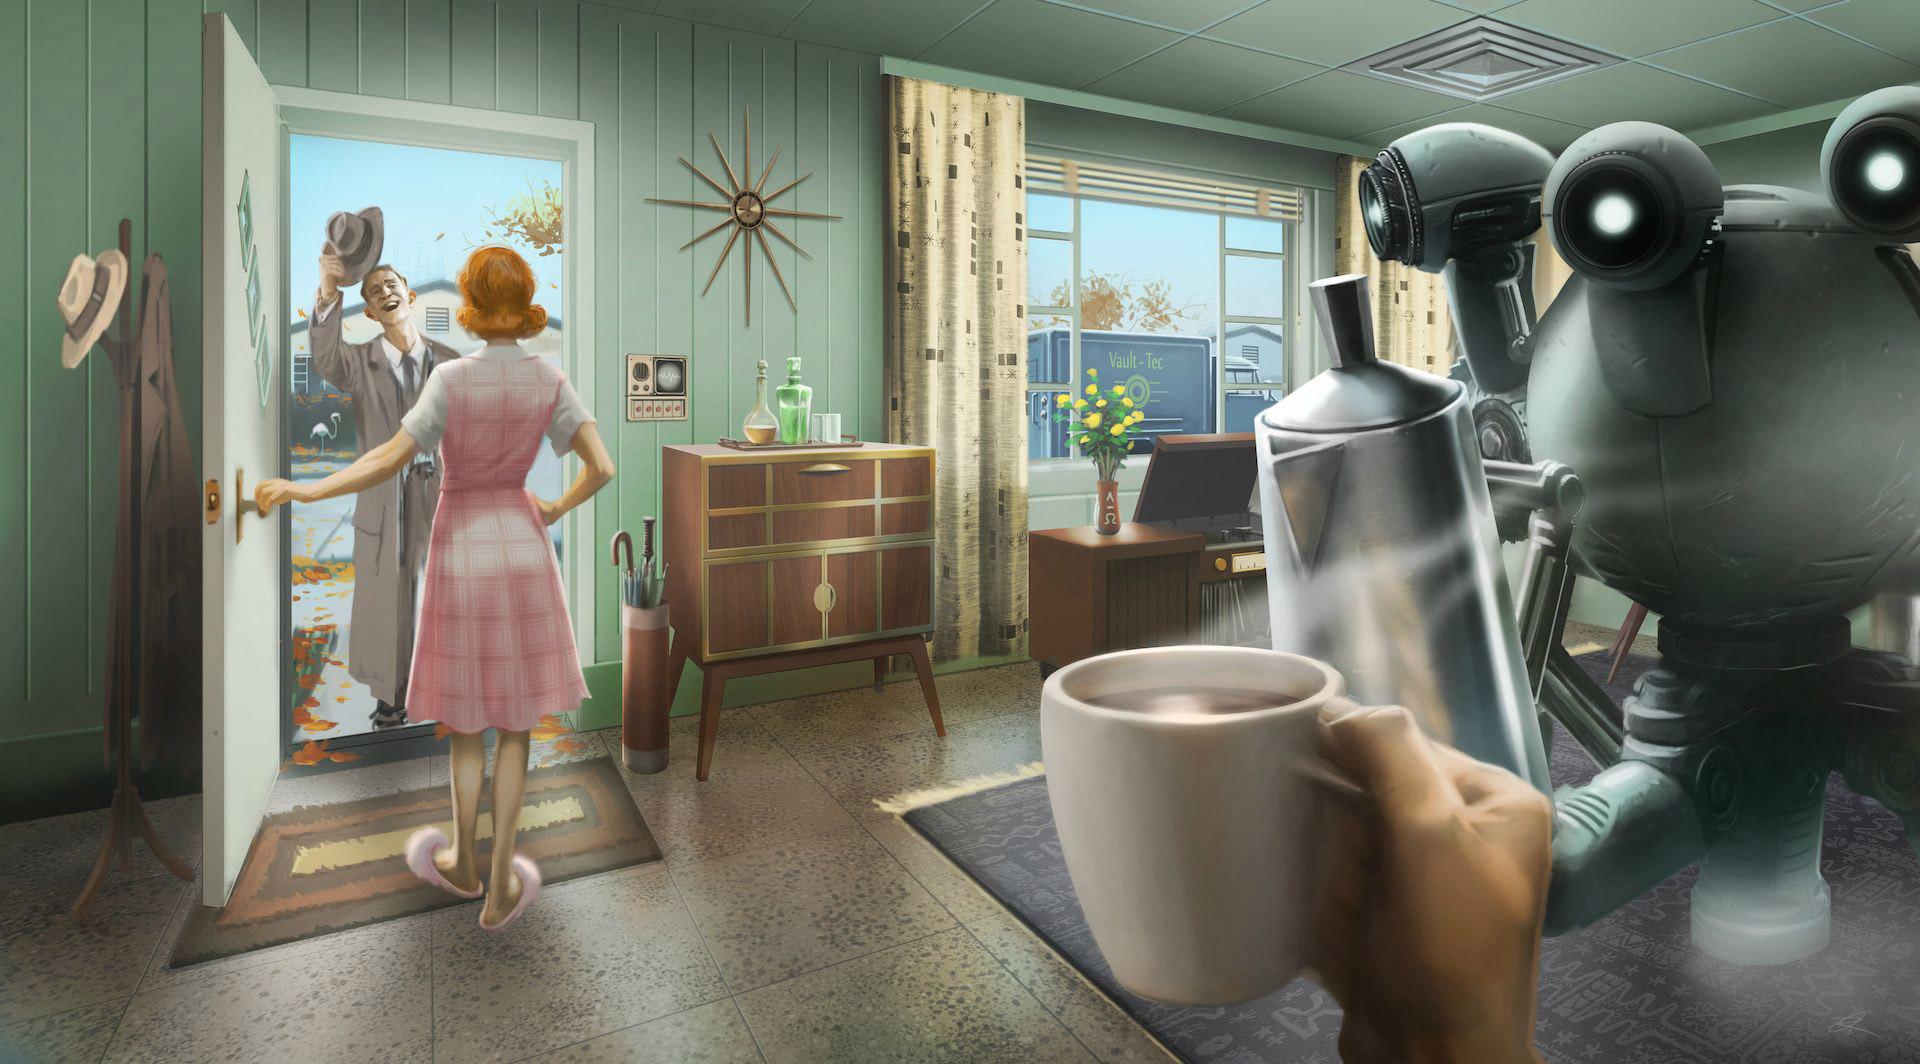 fallout 4 game play screenshot 2